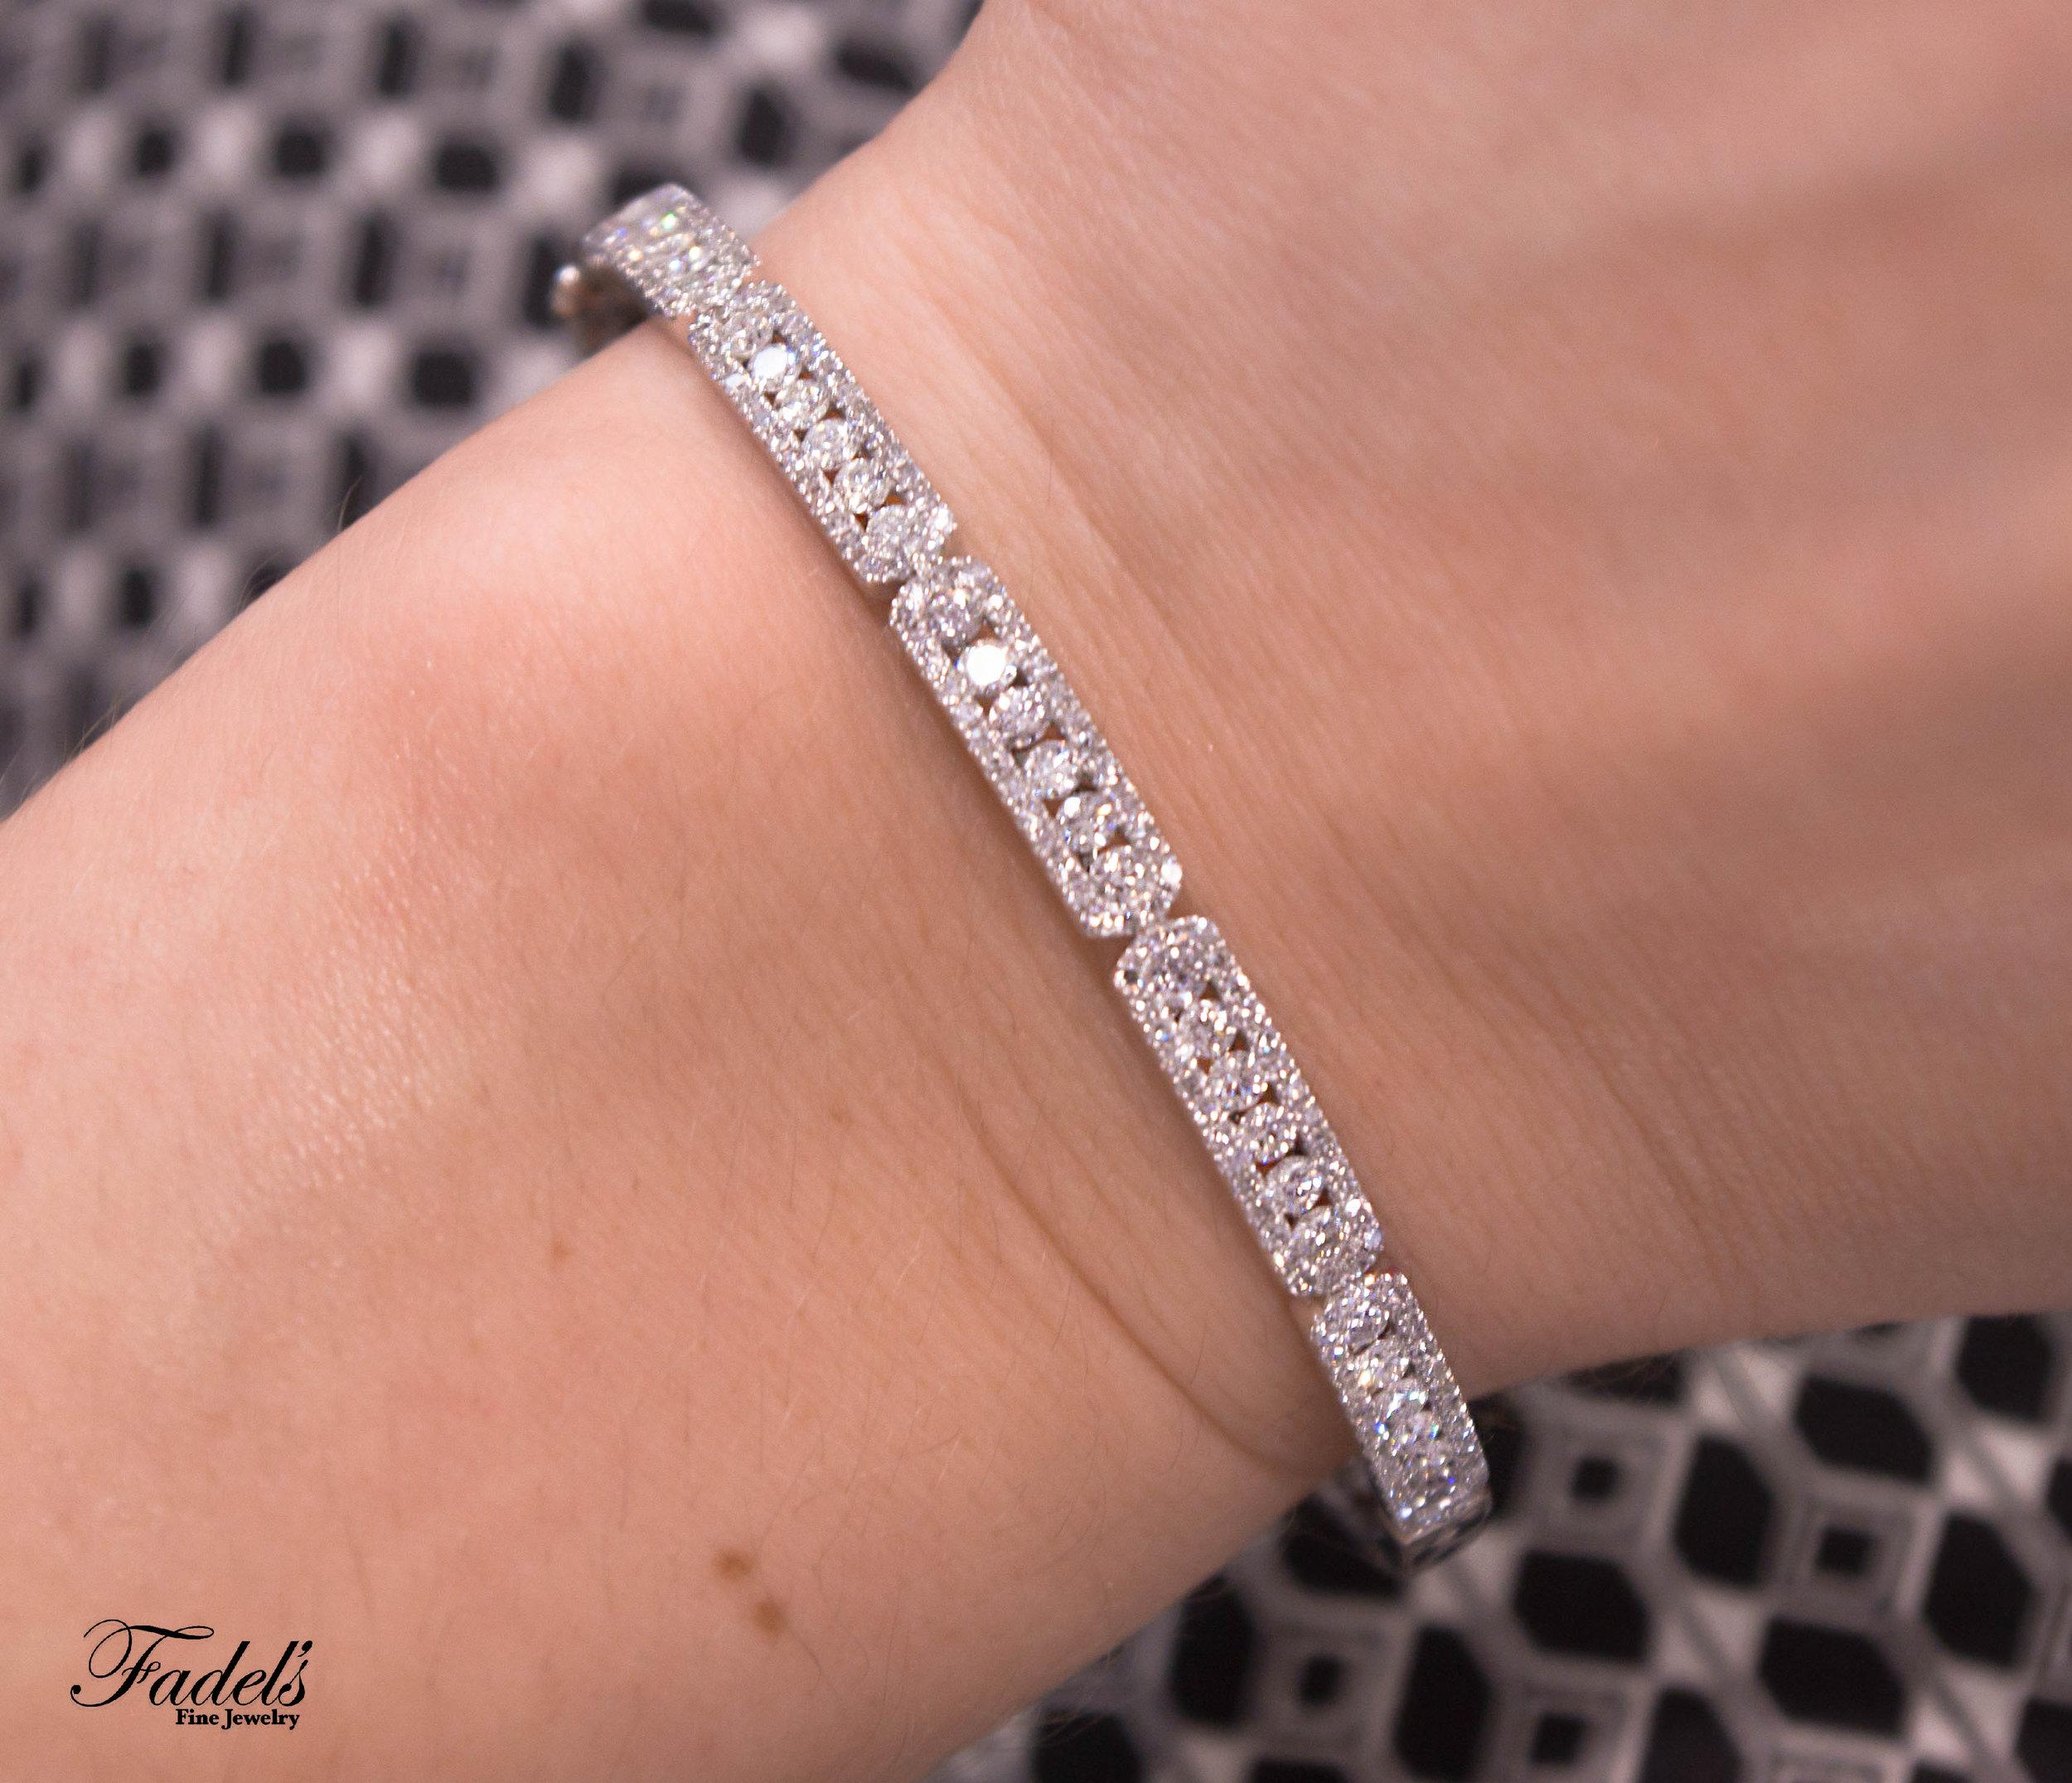 Bracelet 14KW Daimond Bangle.JPG